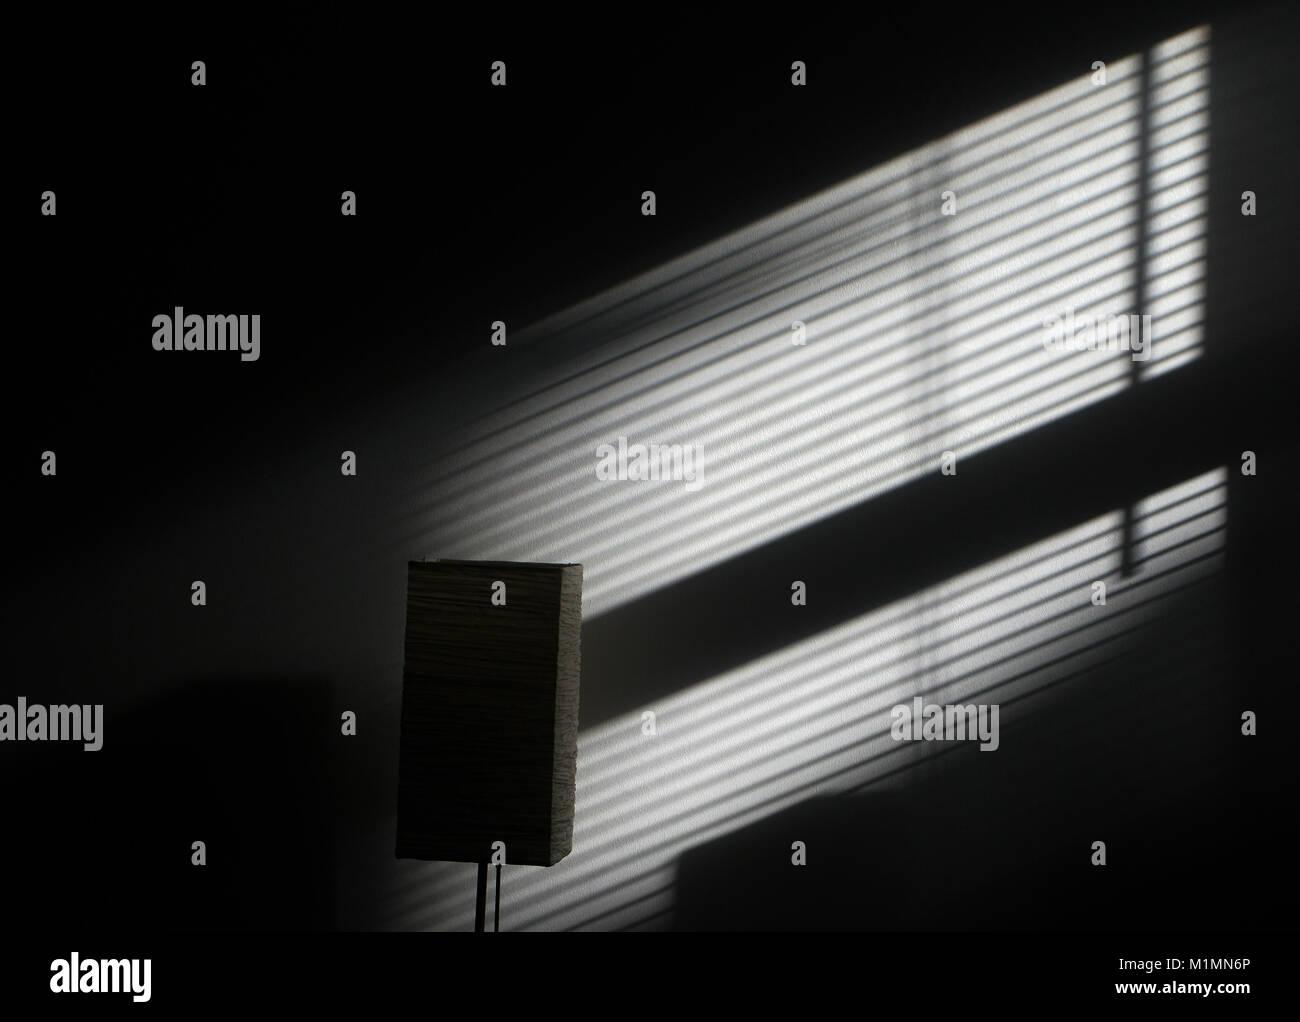 Light and shadow on wall - Stock Image